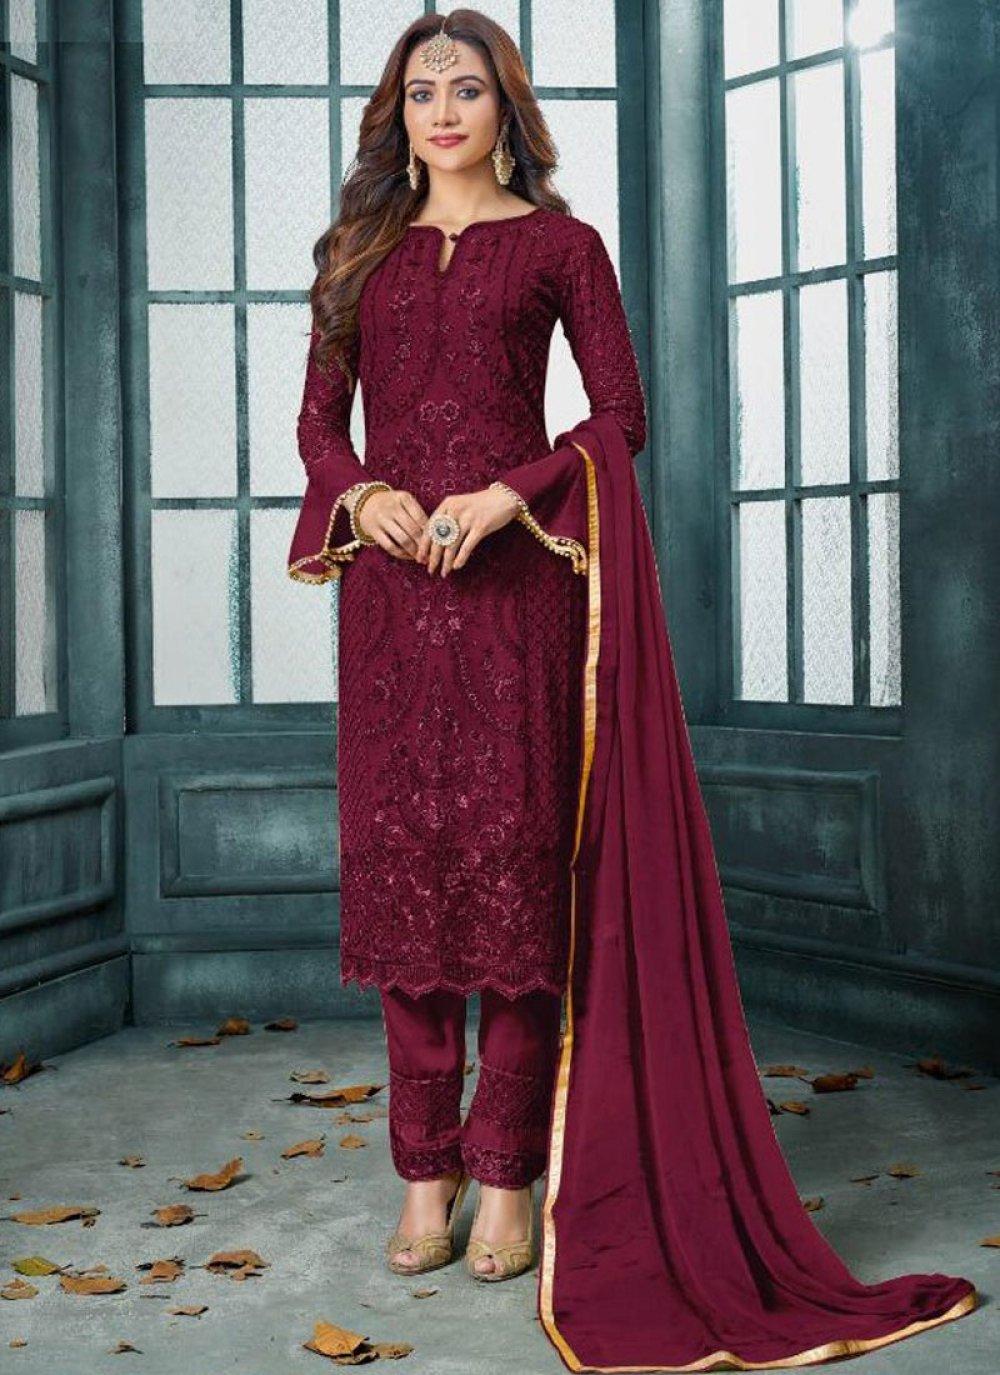 Faux Georgette Embroidered Designer Salwar Kameez in Maroon